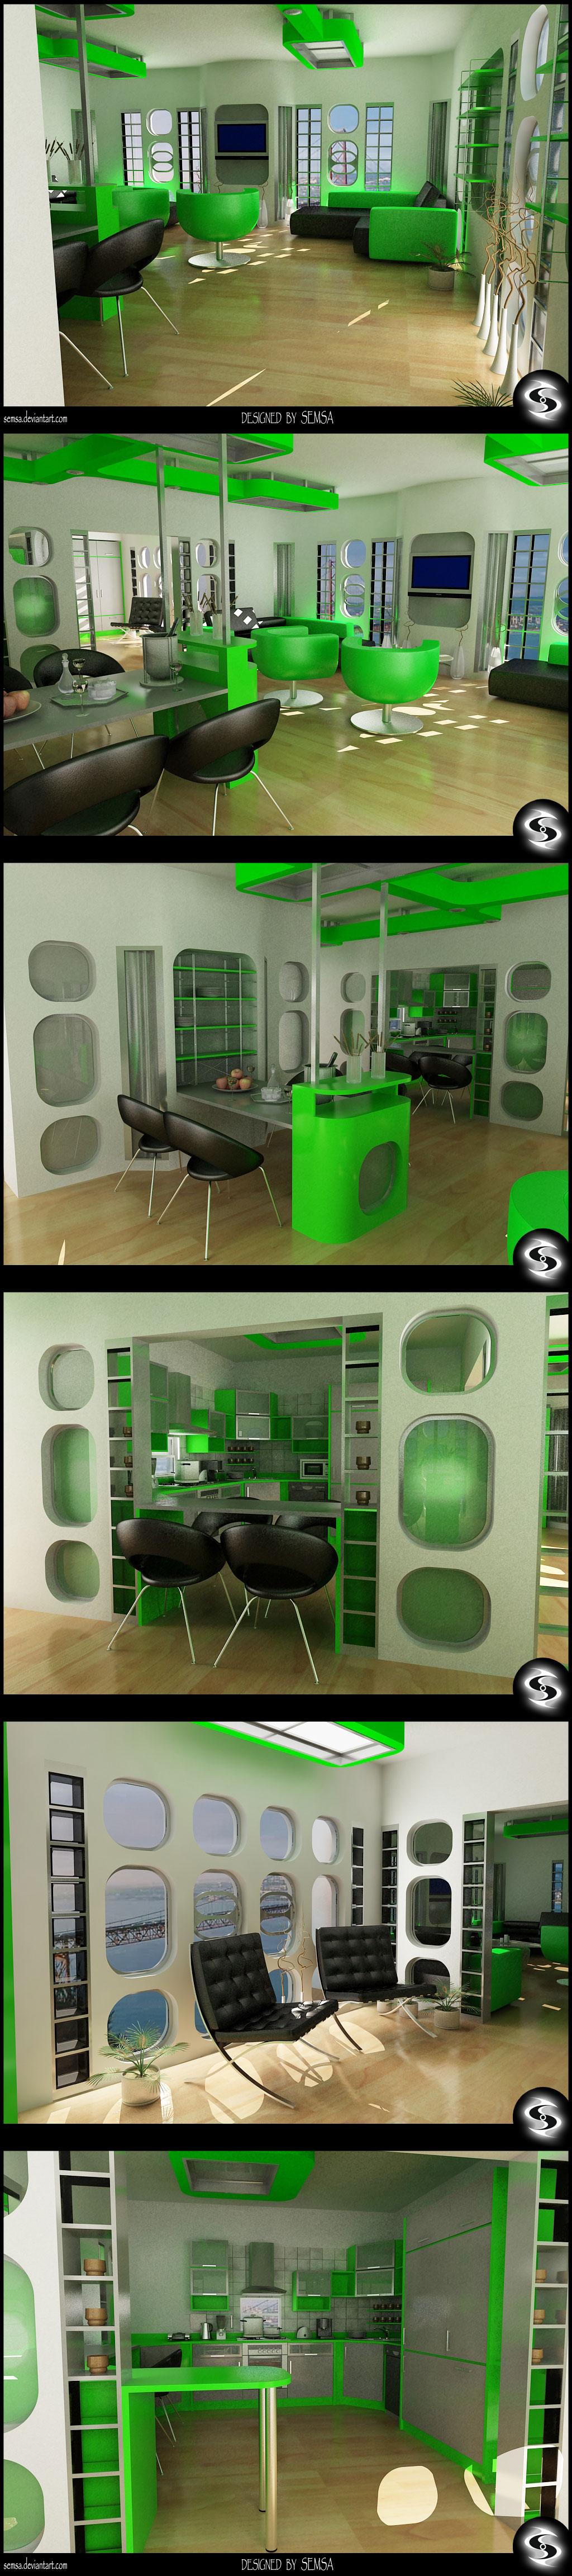 Green Kitchen N' Living Room